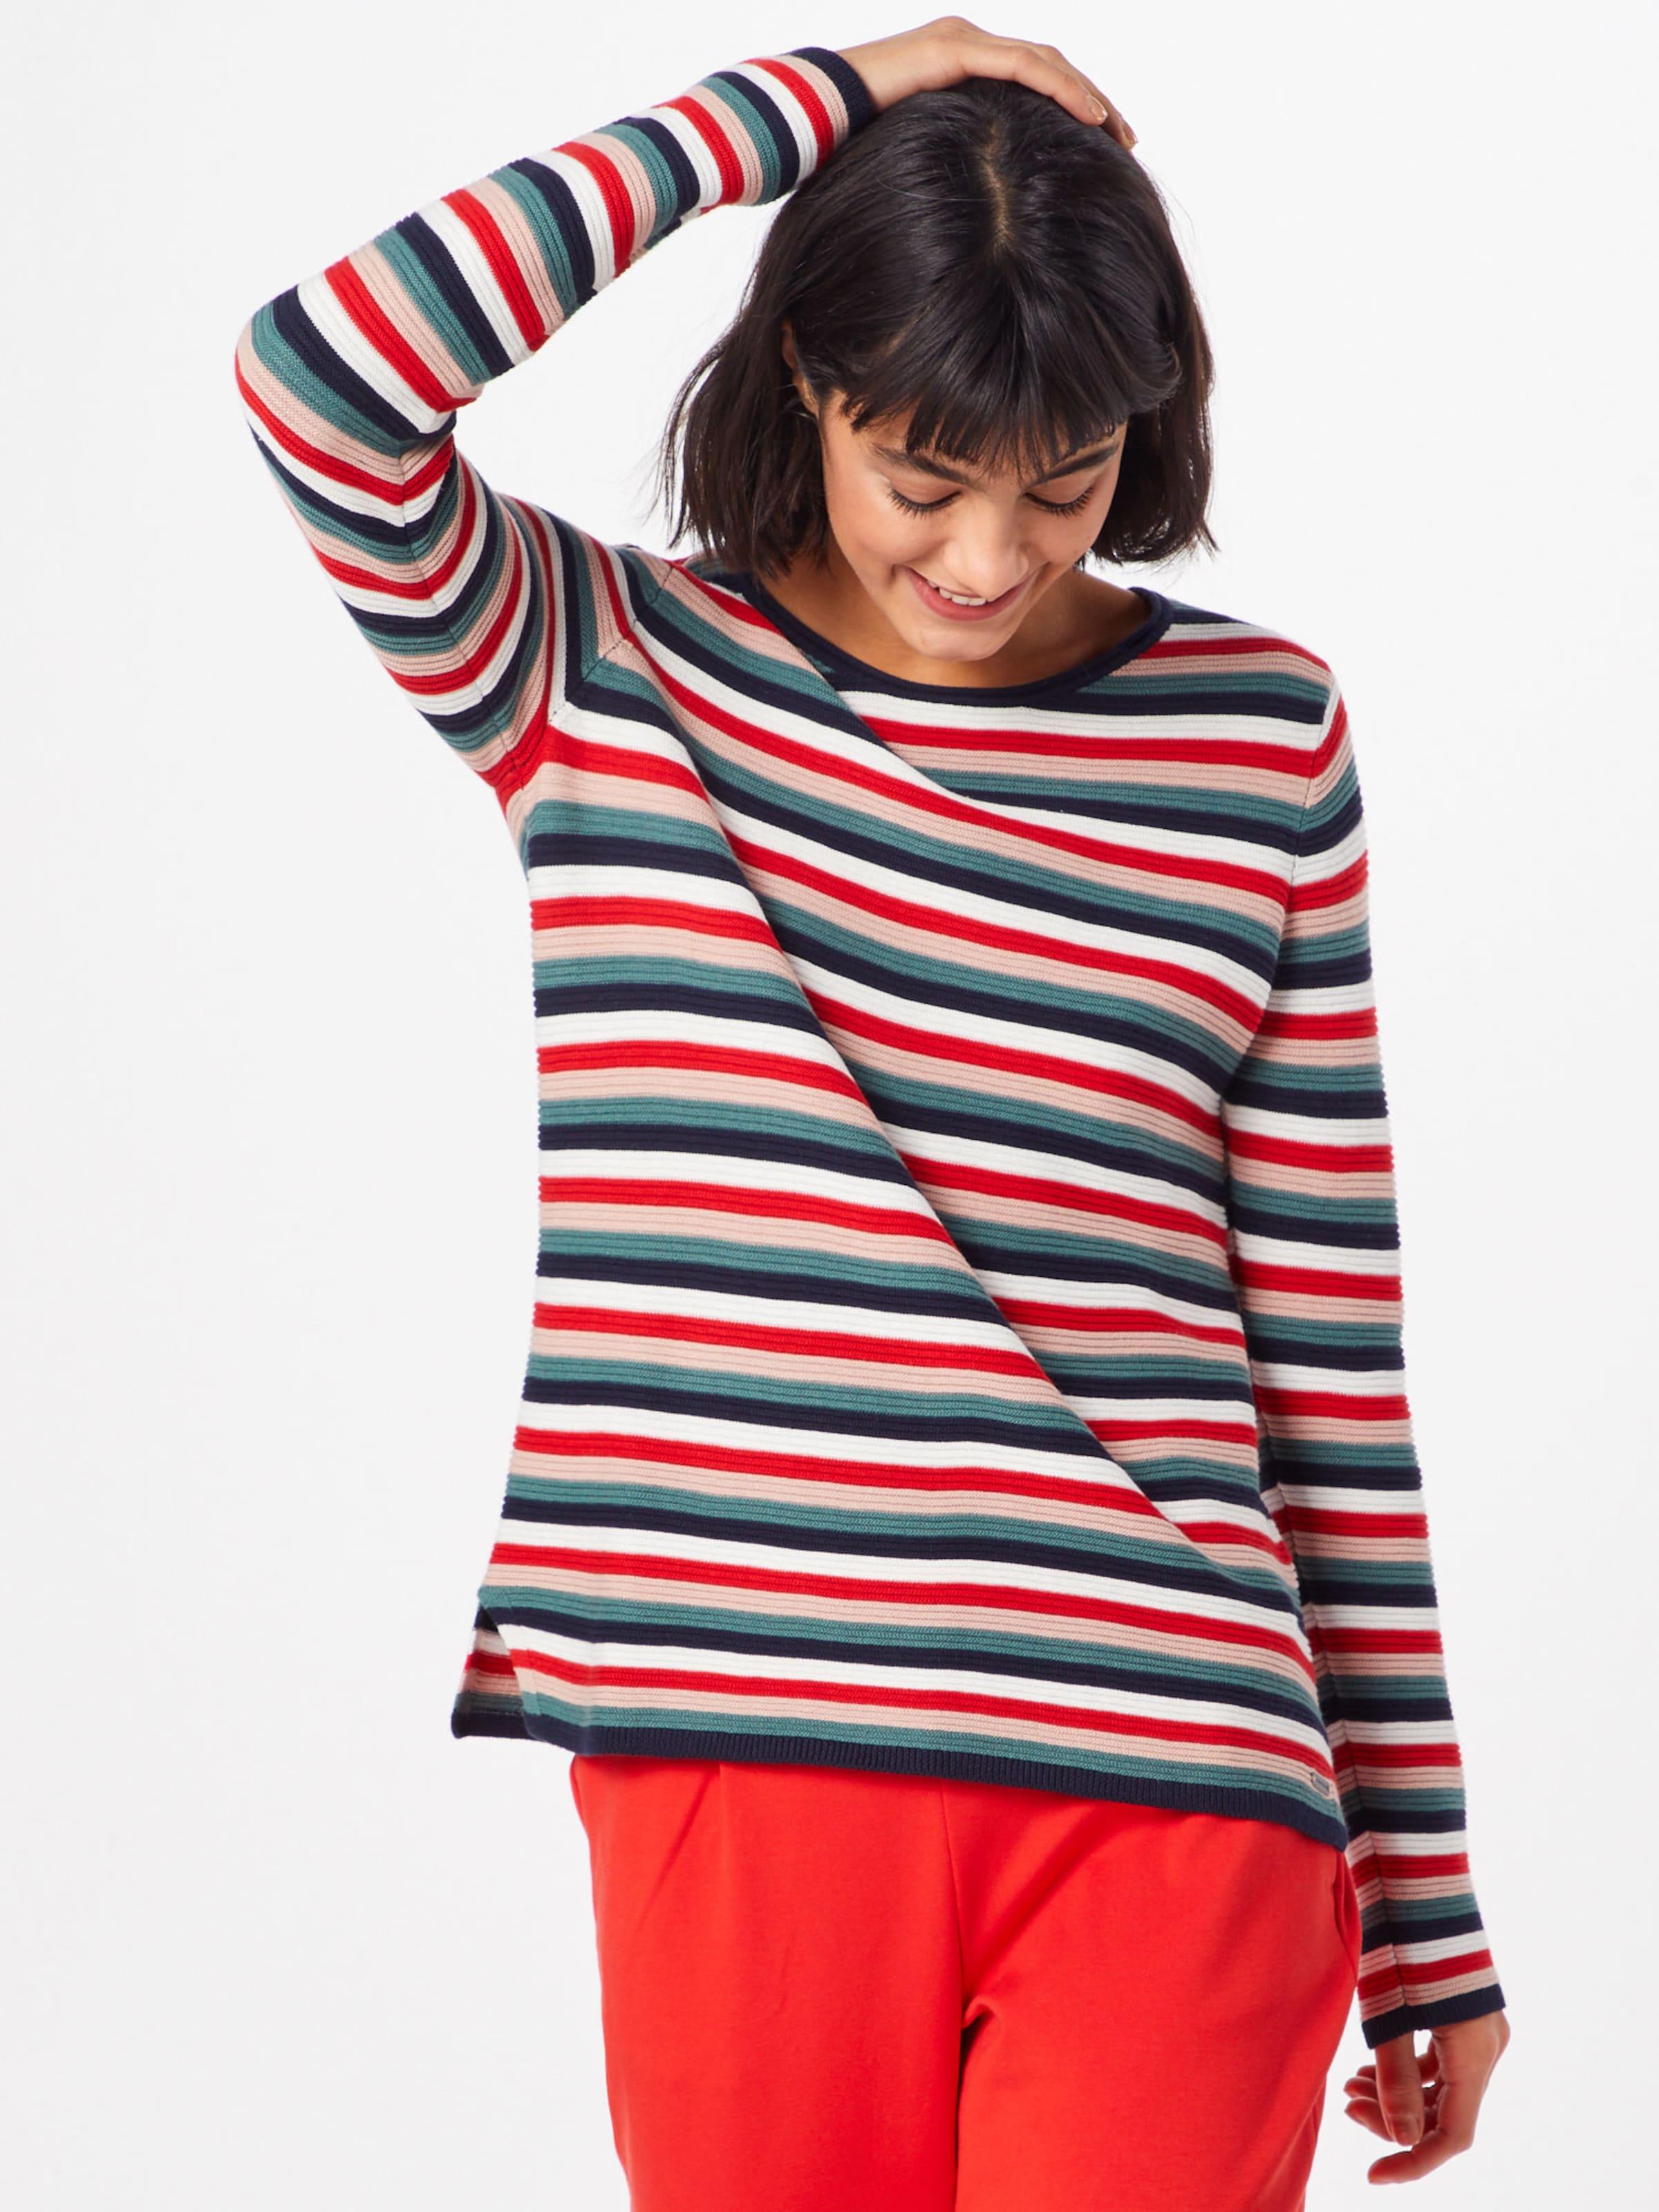 NudeBlau Petrol Sweater 'ottomane' Tailor Rot Wei Tom In 1c3FTlKJ